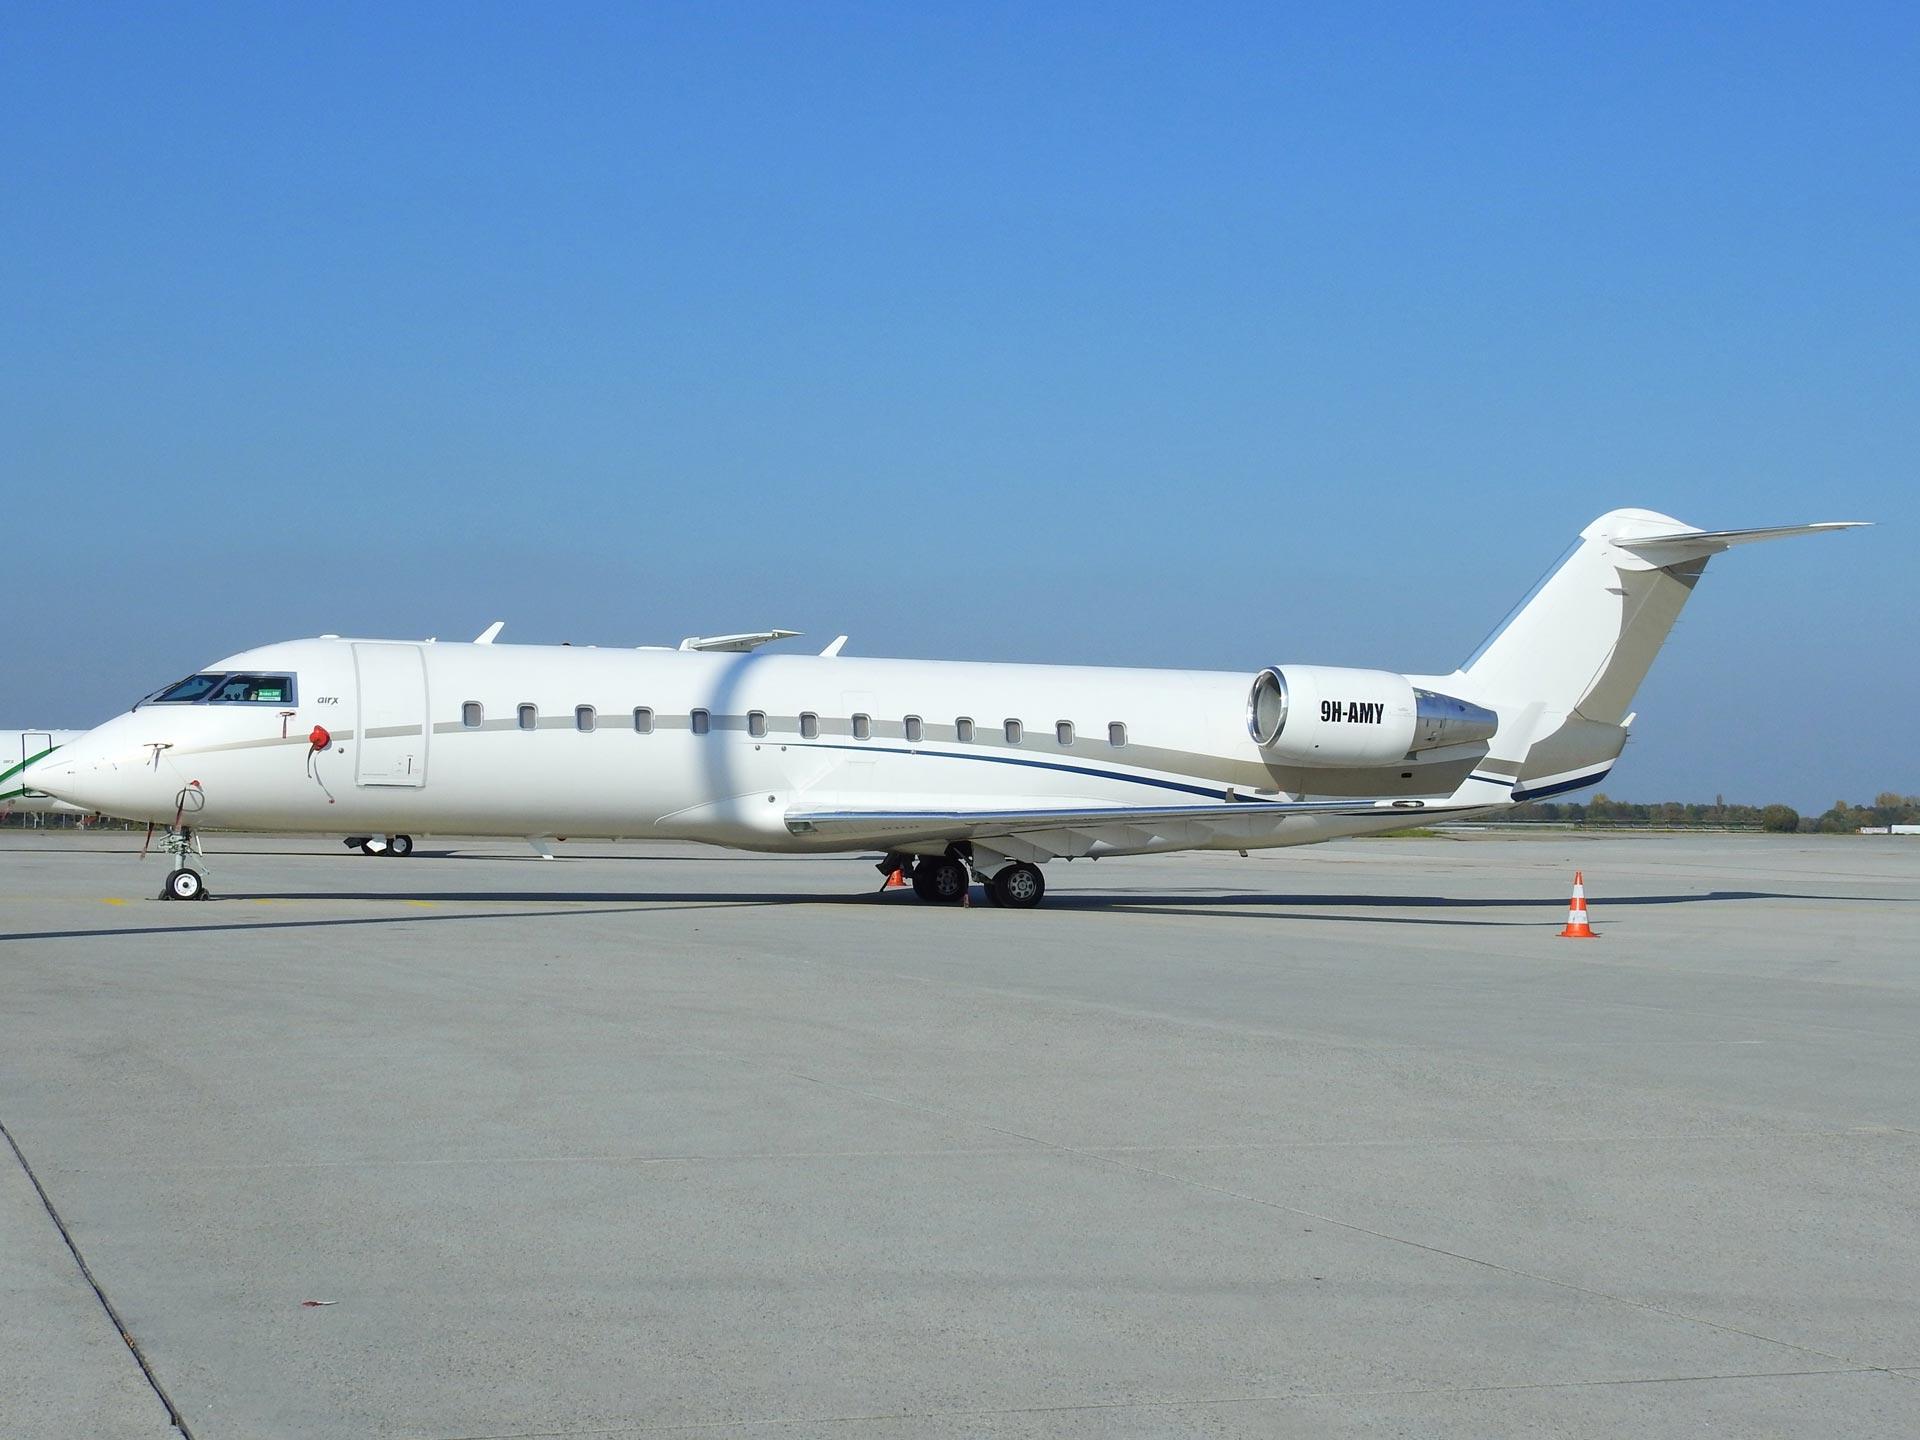 9H-AMY-AIR-X-Charter-Bombardier-CRJ-200ER-(CL-600-2B19)-(2)